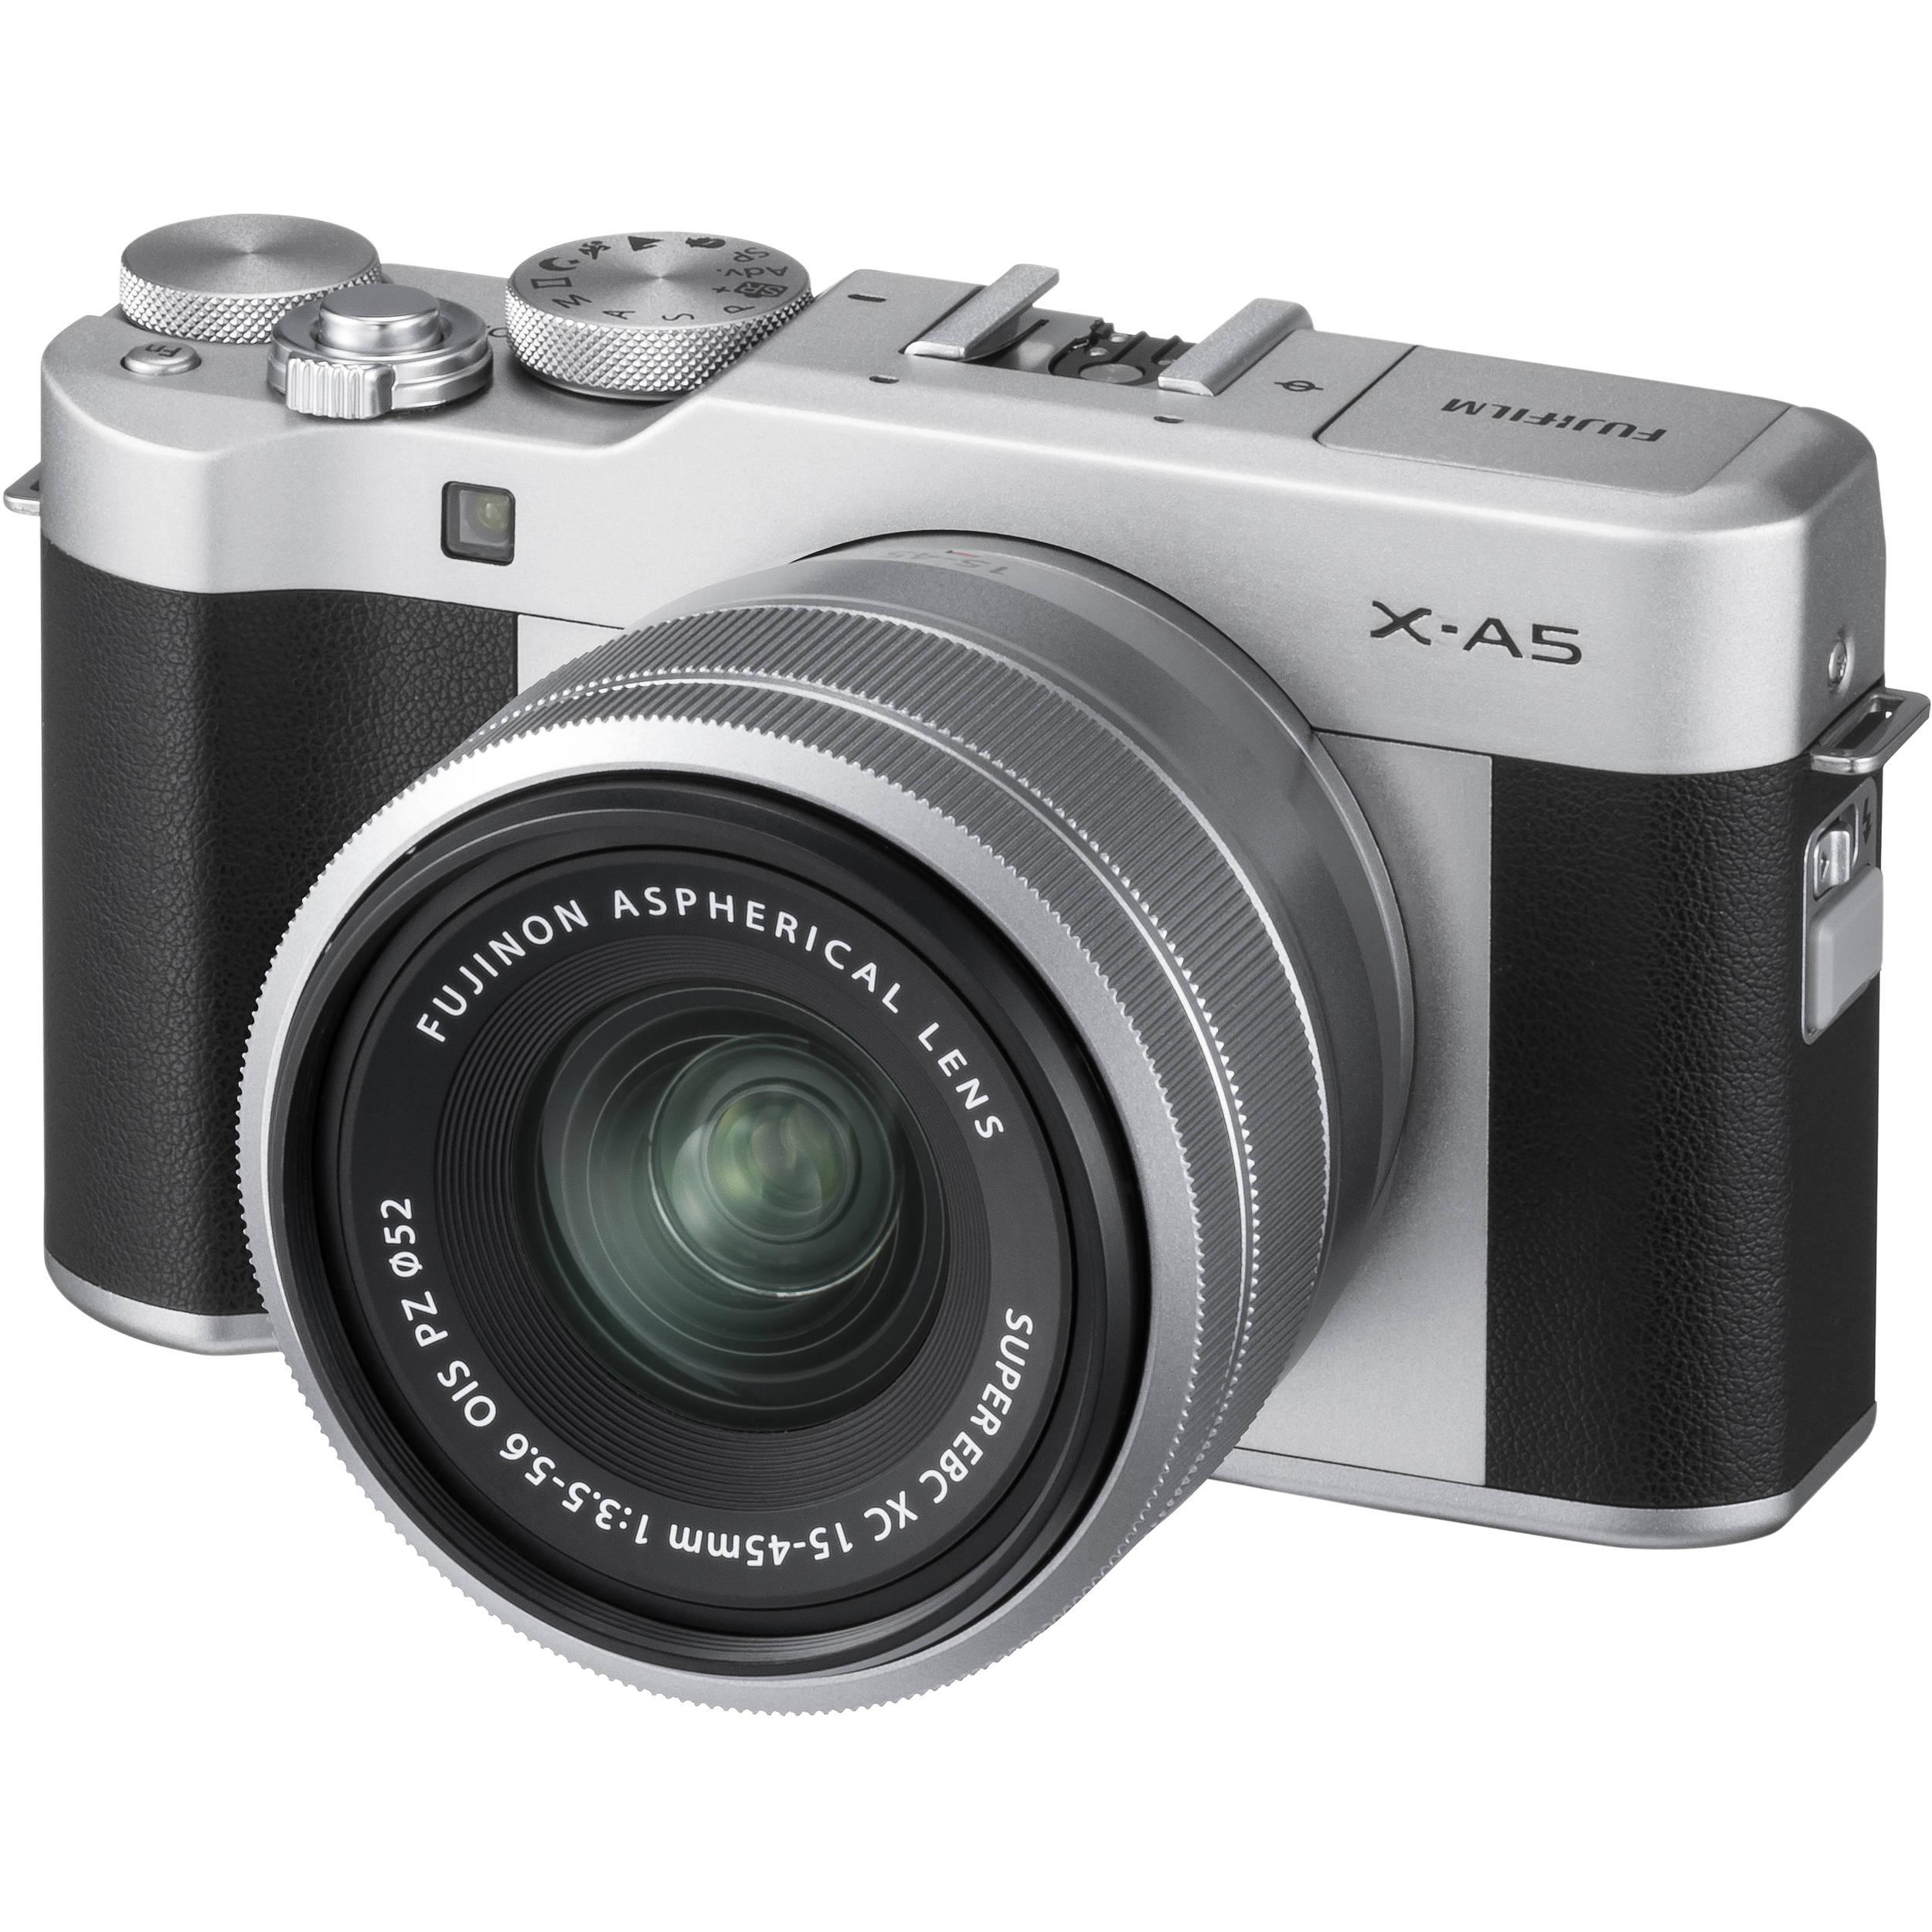 FUJIFILM X-A5 Mirrorless Digital Camera with 15-45mm 16568896